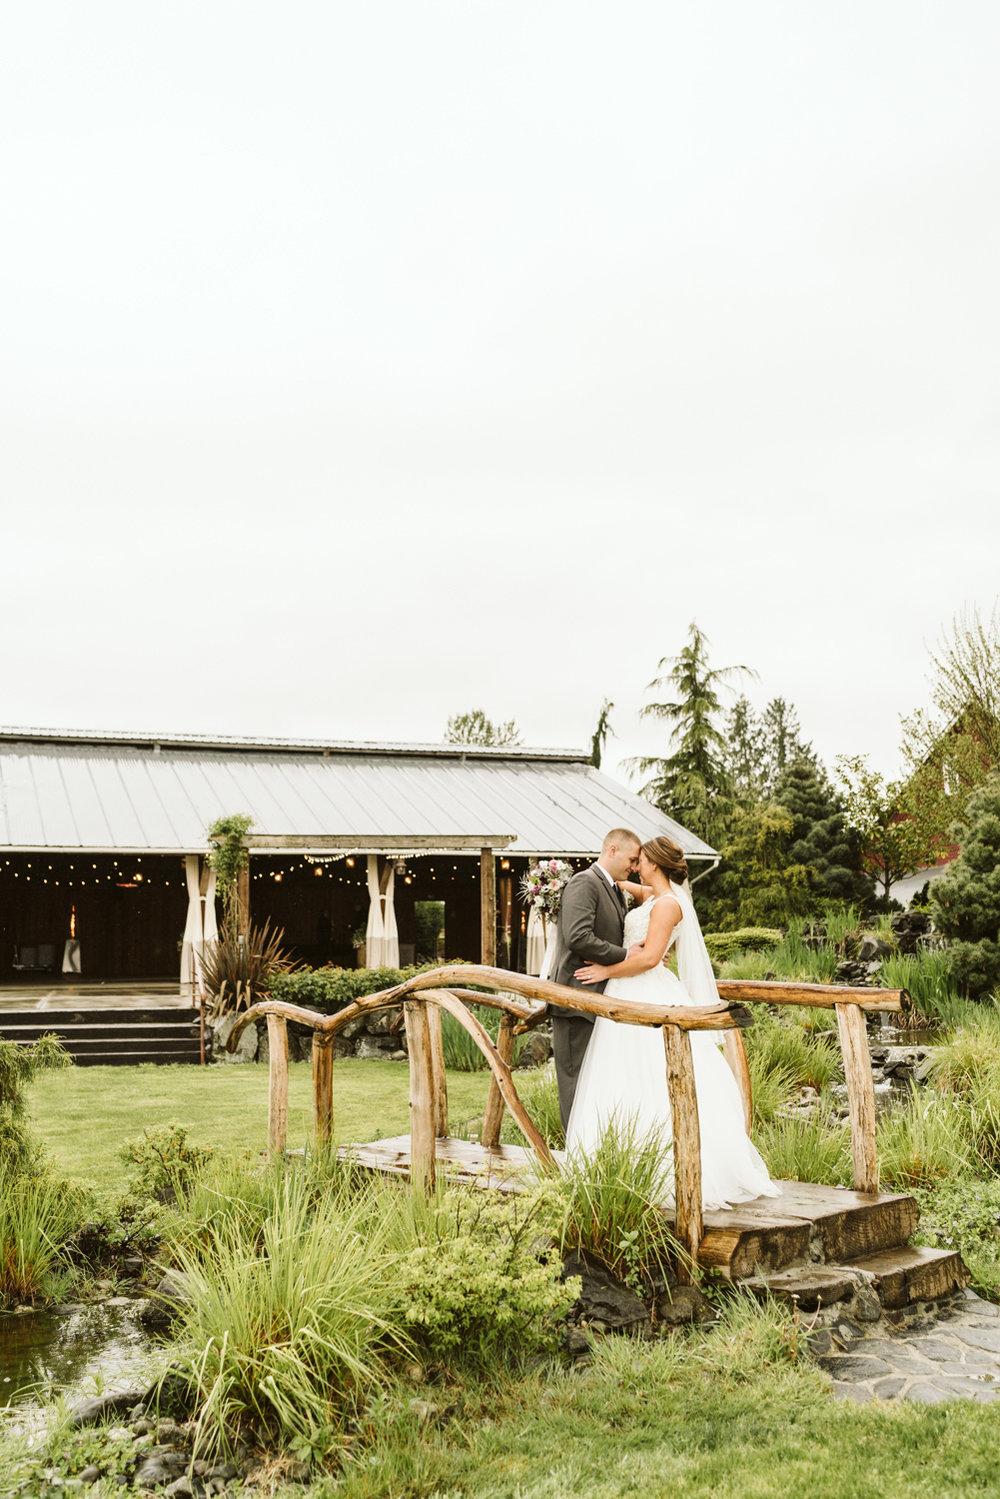 April Yentas Photography - jen and anthony wedding-67.jpg